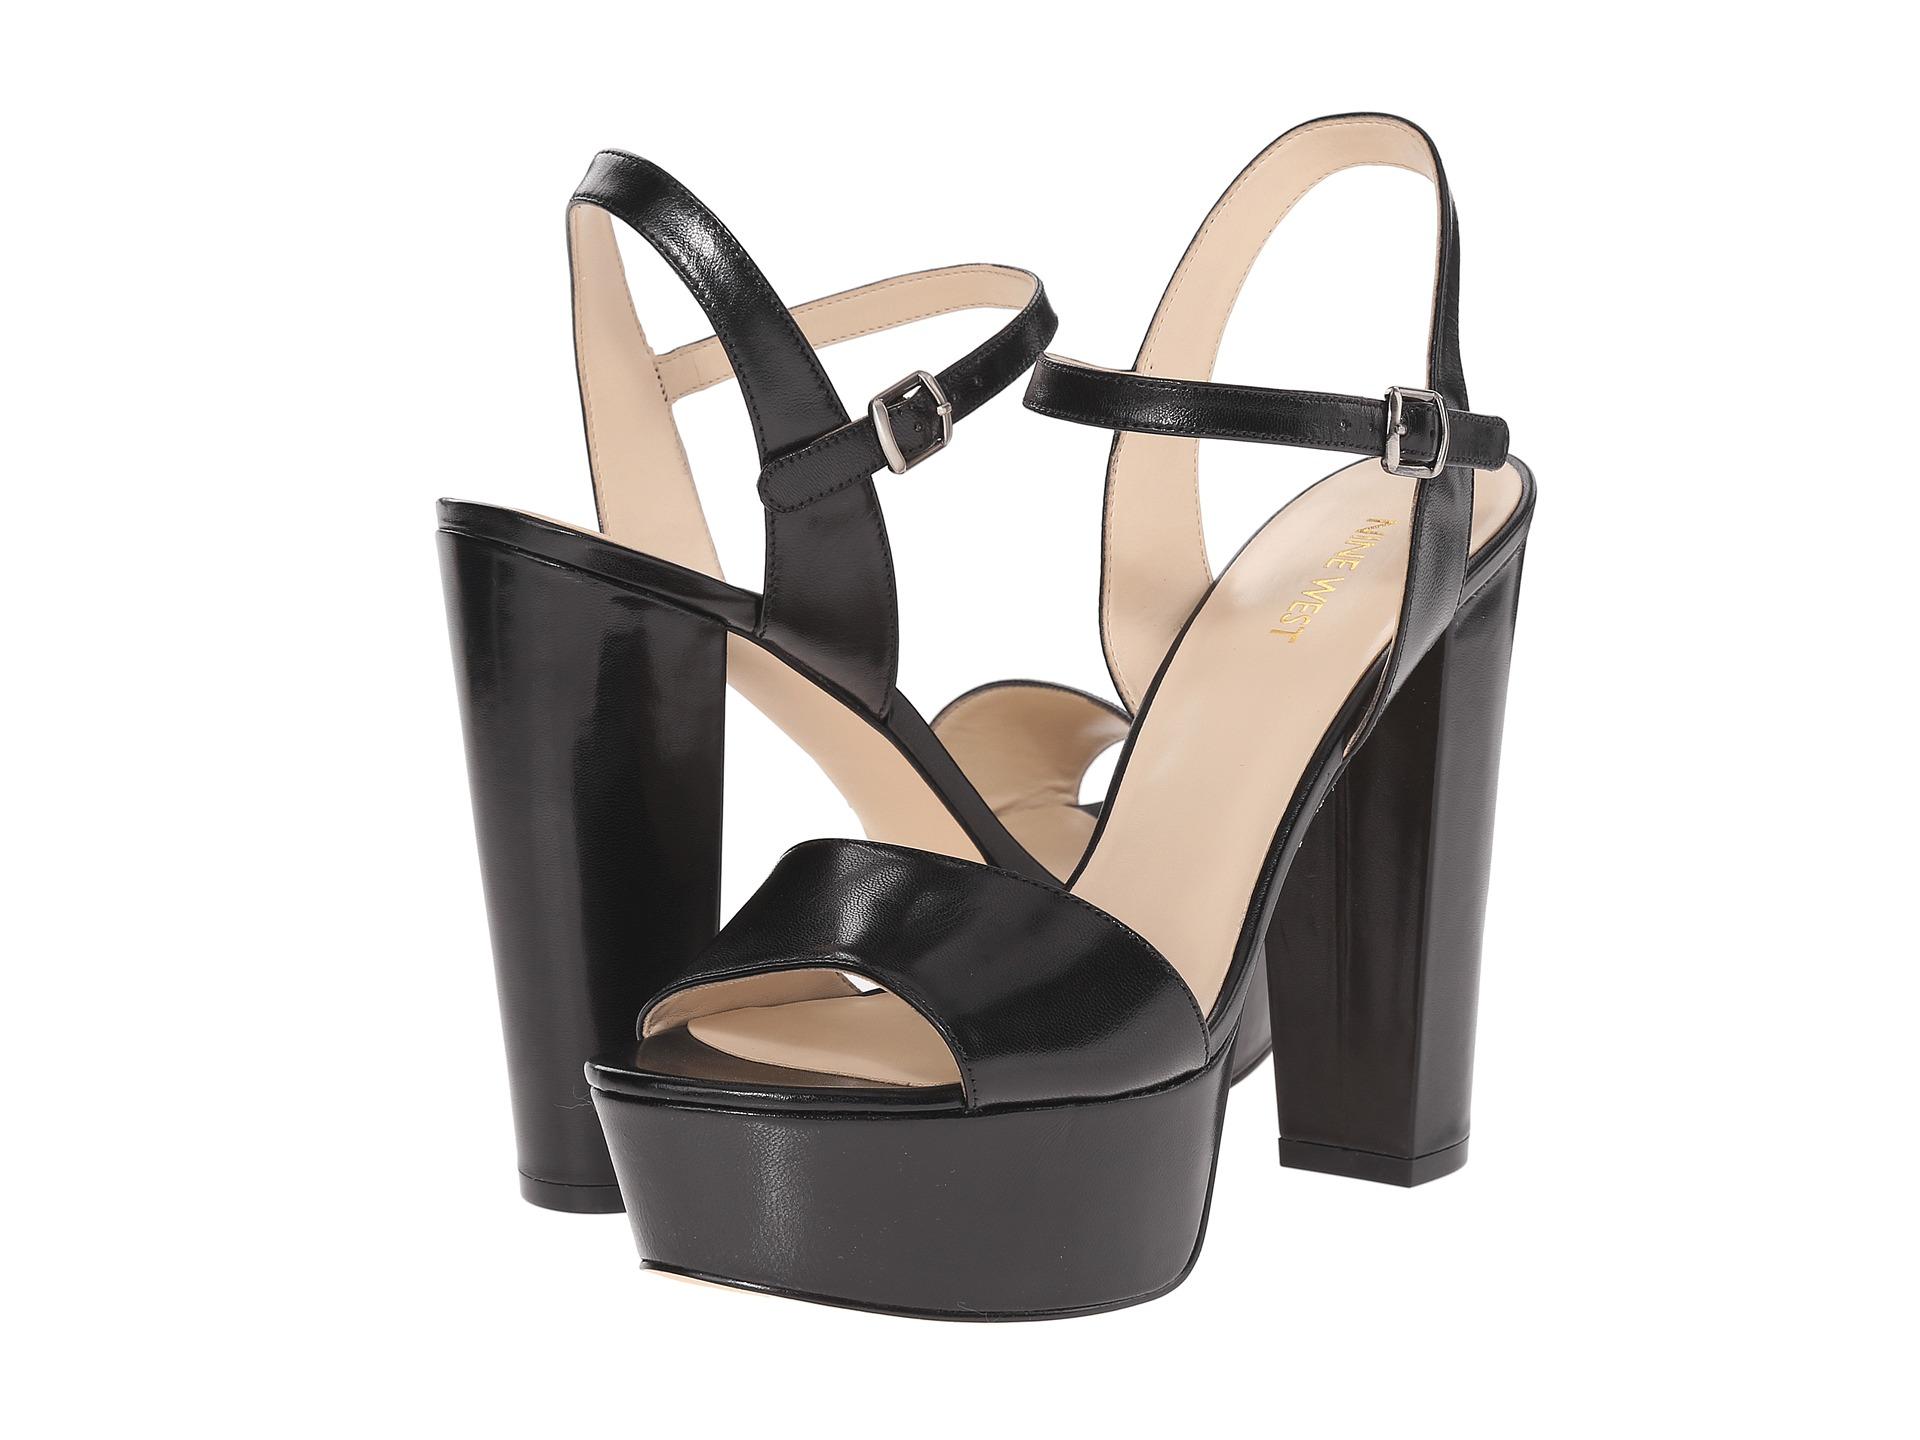 Black sandals nine west - Black Sandals Nine West 28